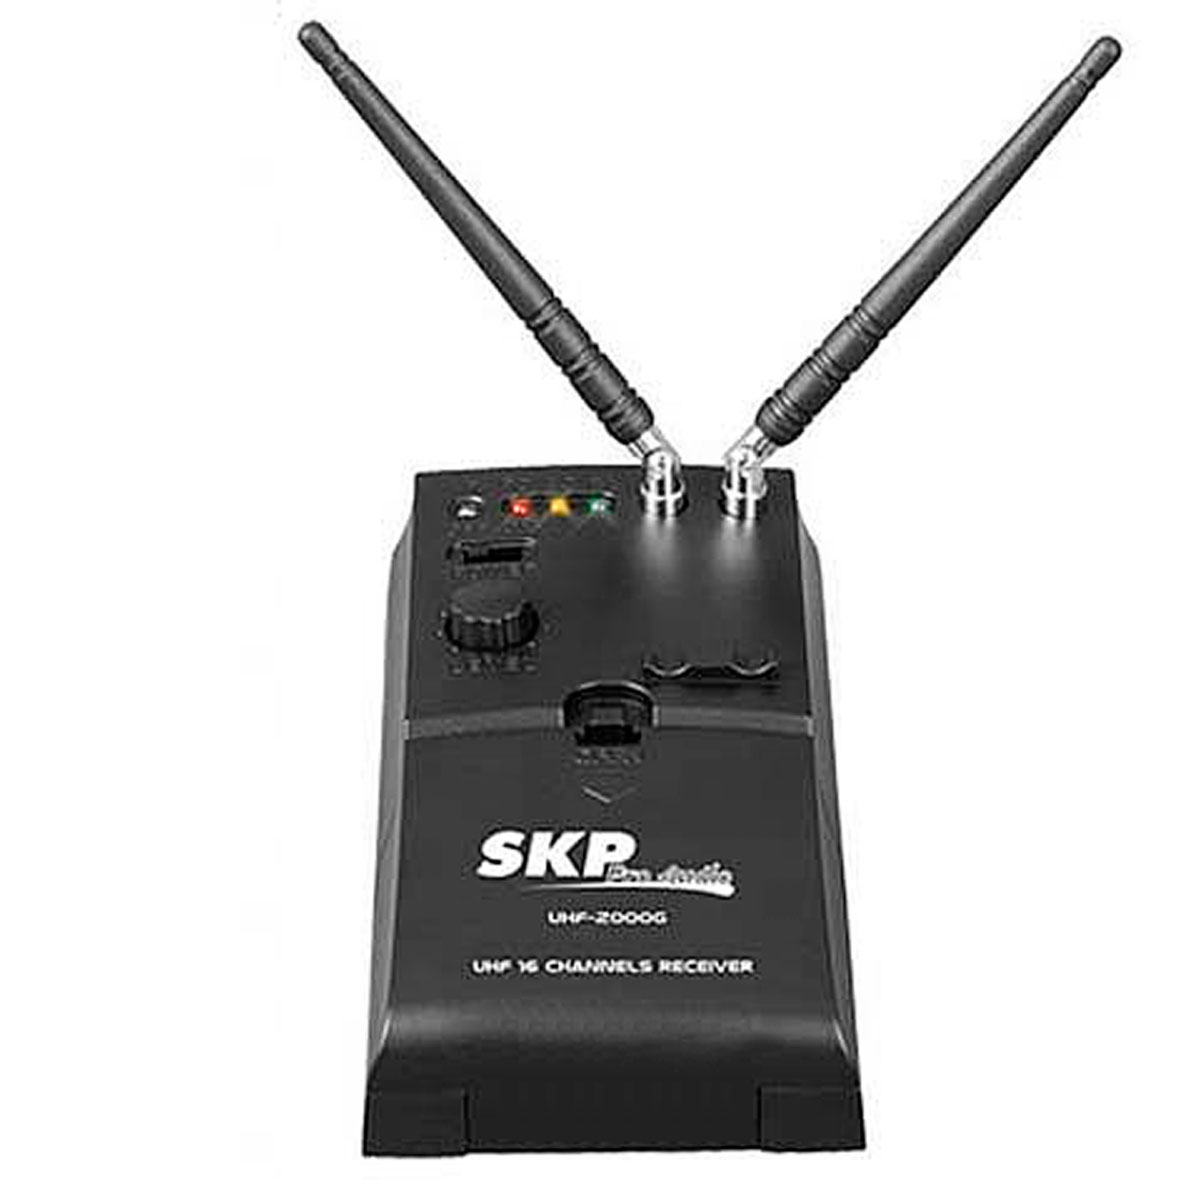 UHF2000G - Microfone s/ Fio p/ Instrumentos UHF 2000 G - SKP